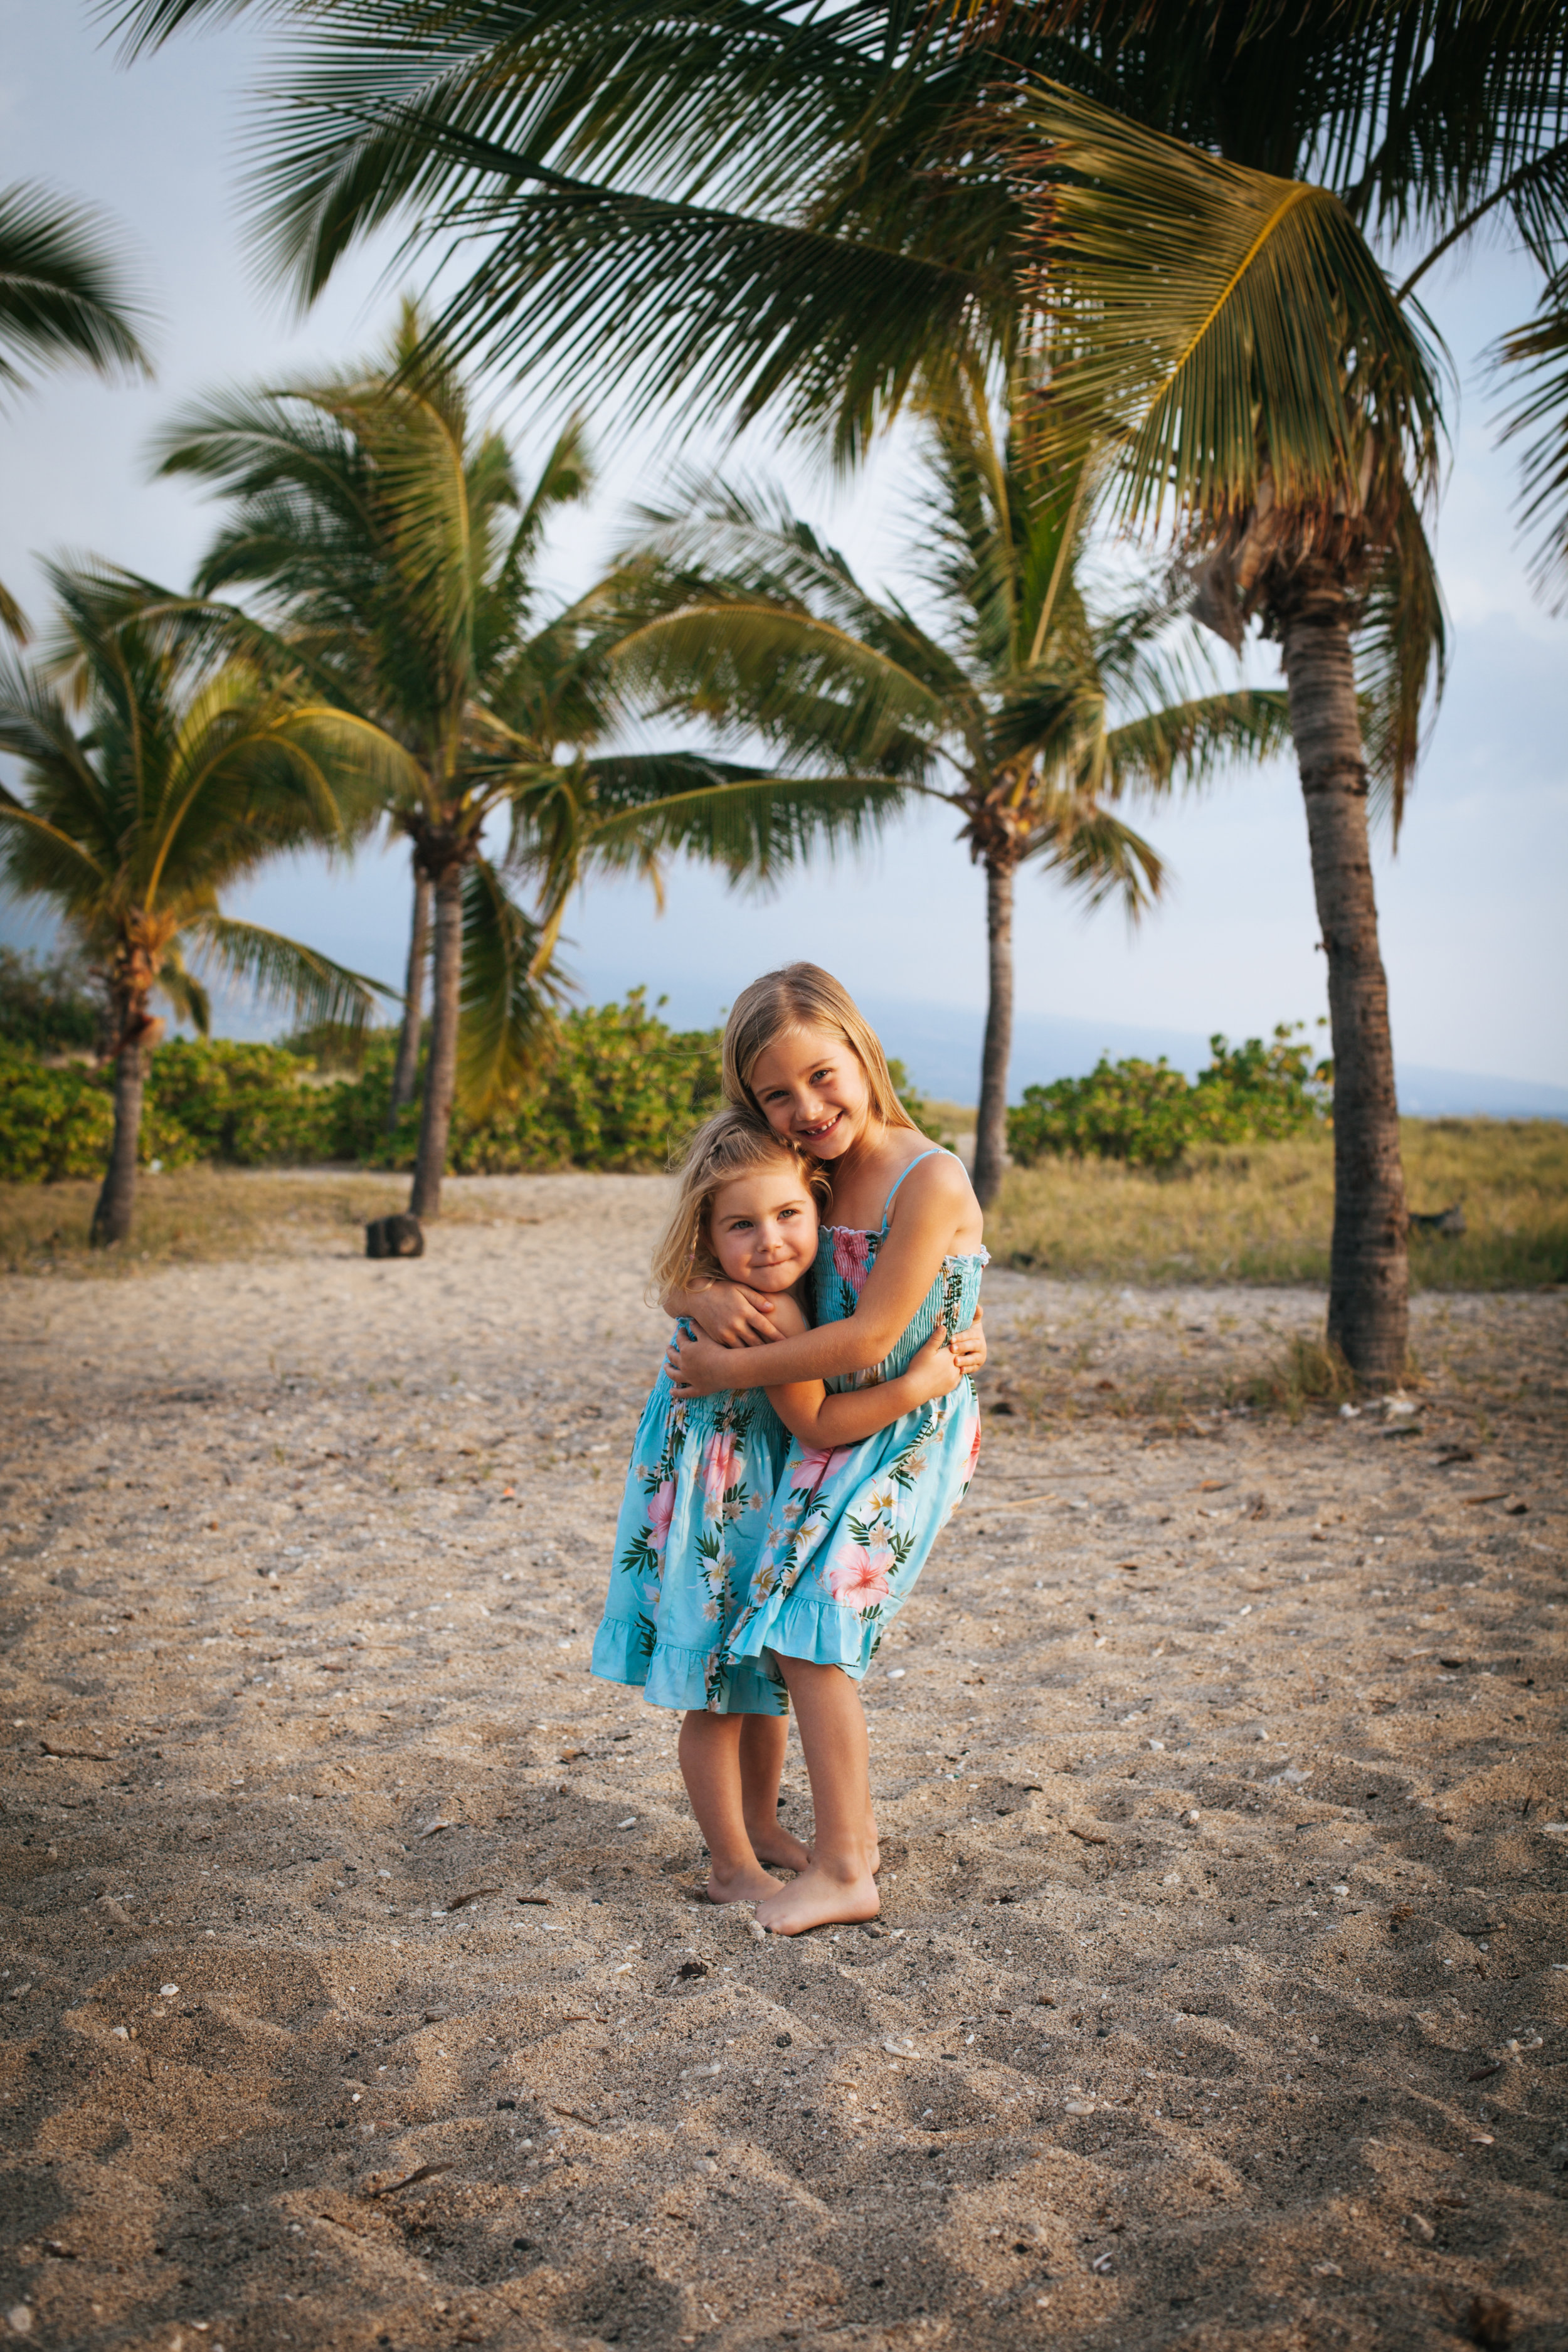 big island hawaii old kona airport beach family © kelilina photography 20170221173859.jpg